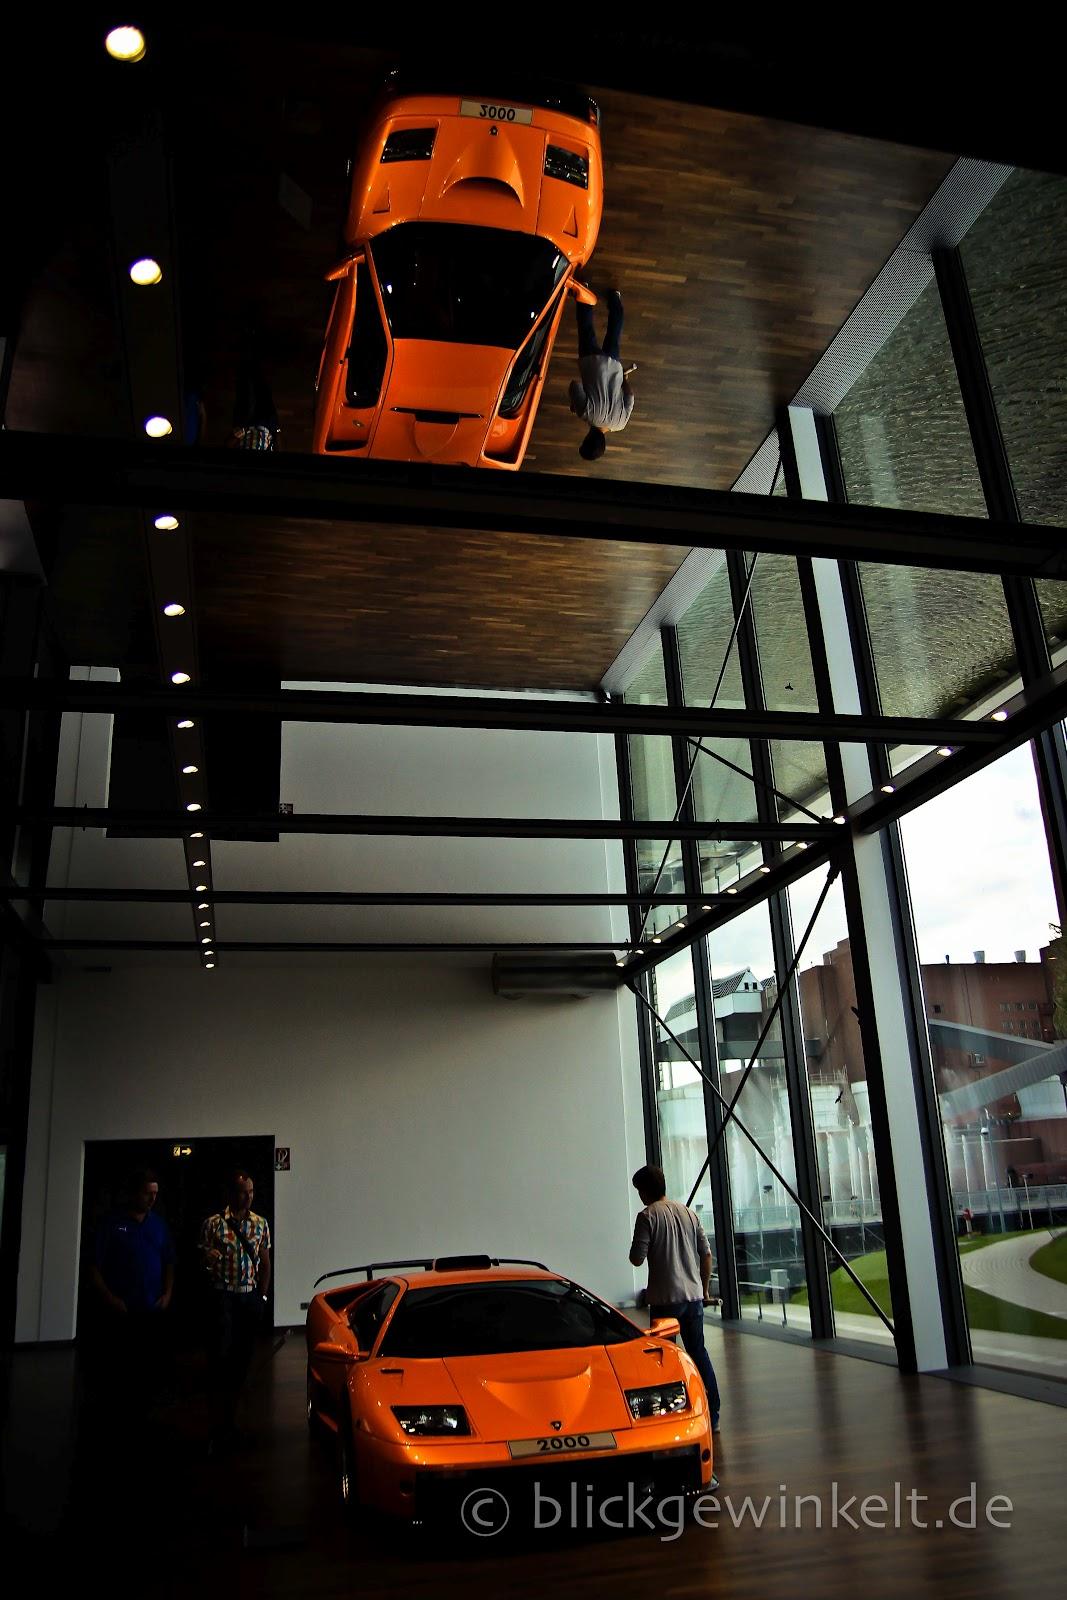 blickgewinkelt die autostadt. Black Bedroom Furniture Sets. Home Design Ideas